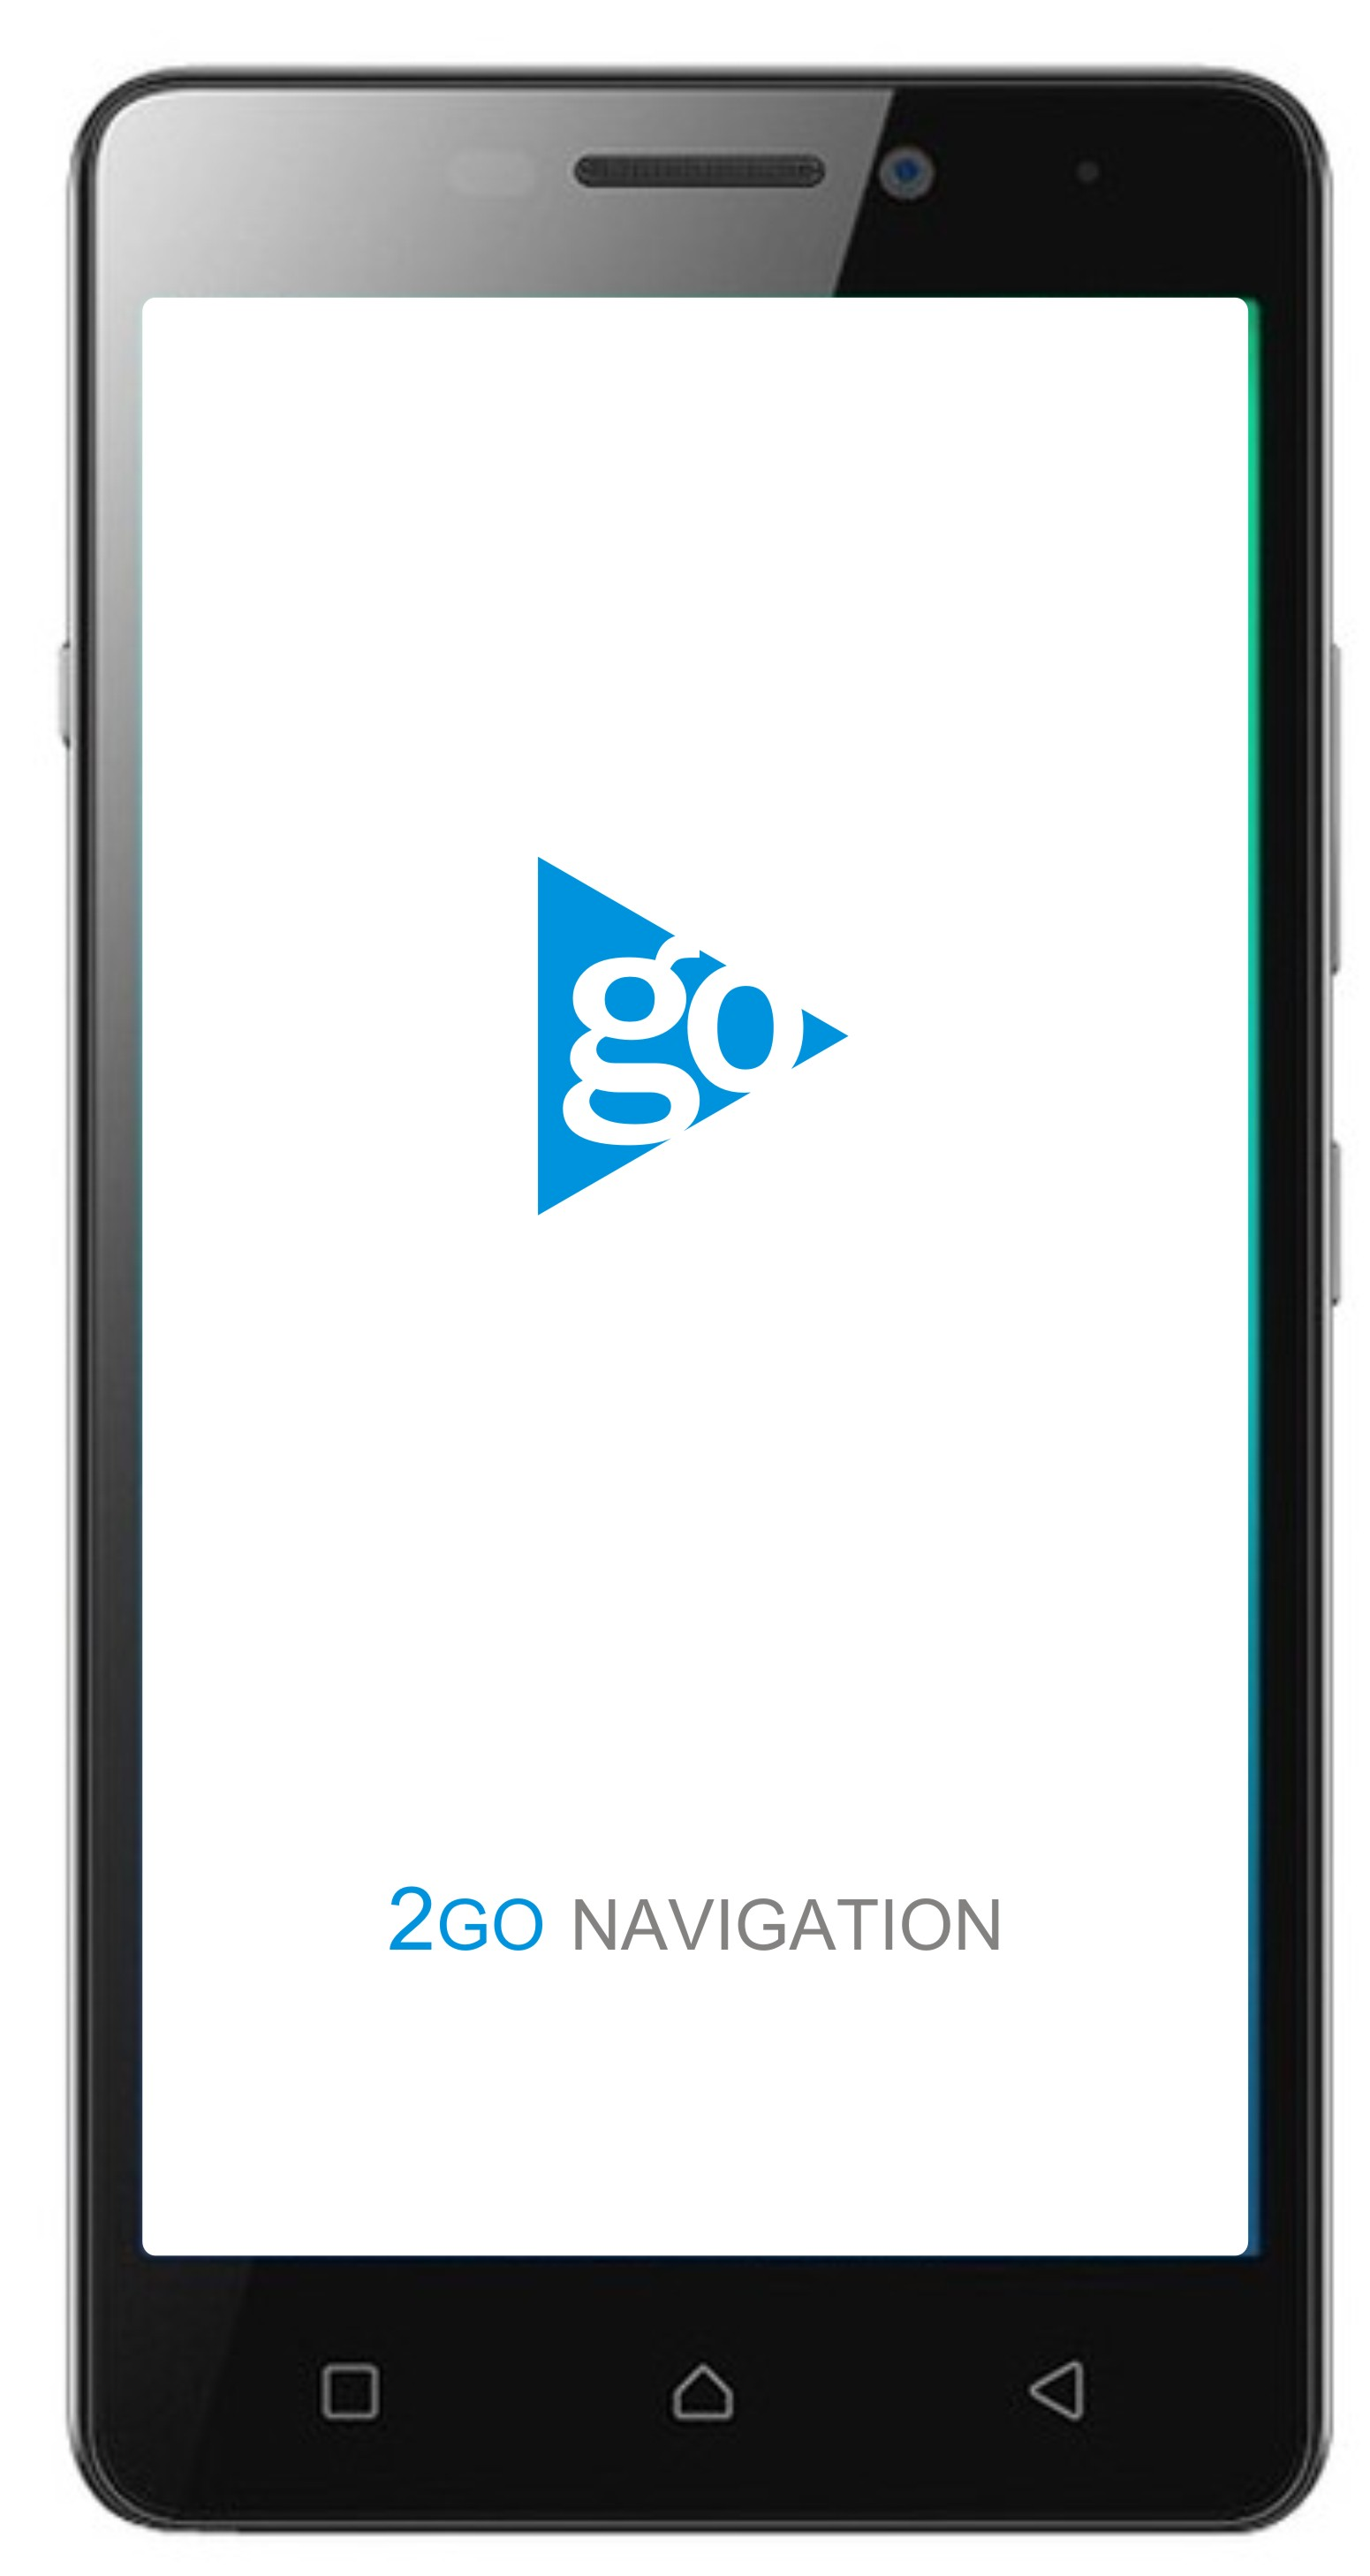 Разработать логотип и экран загрузки приложения фото f_8235a874cfe35b31.jpg